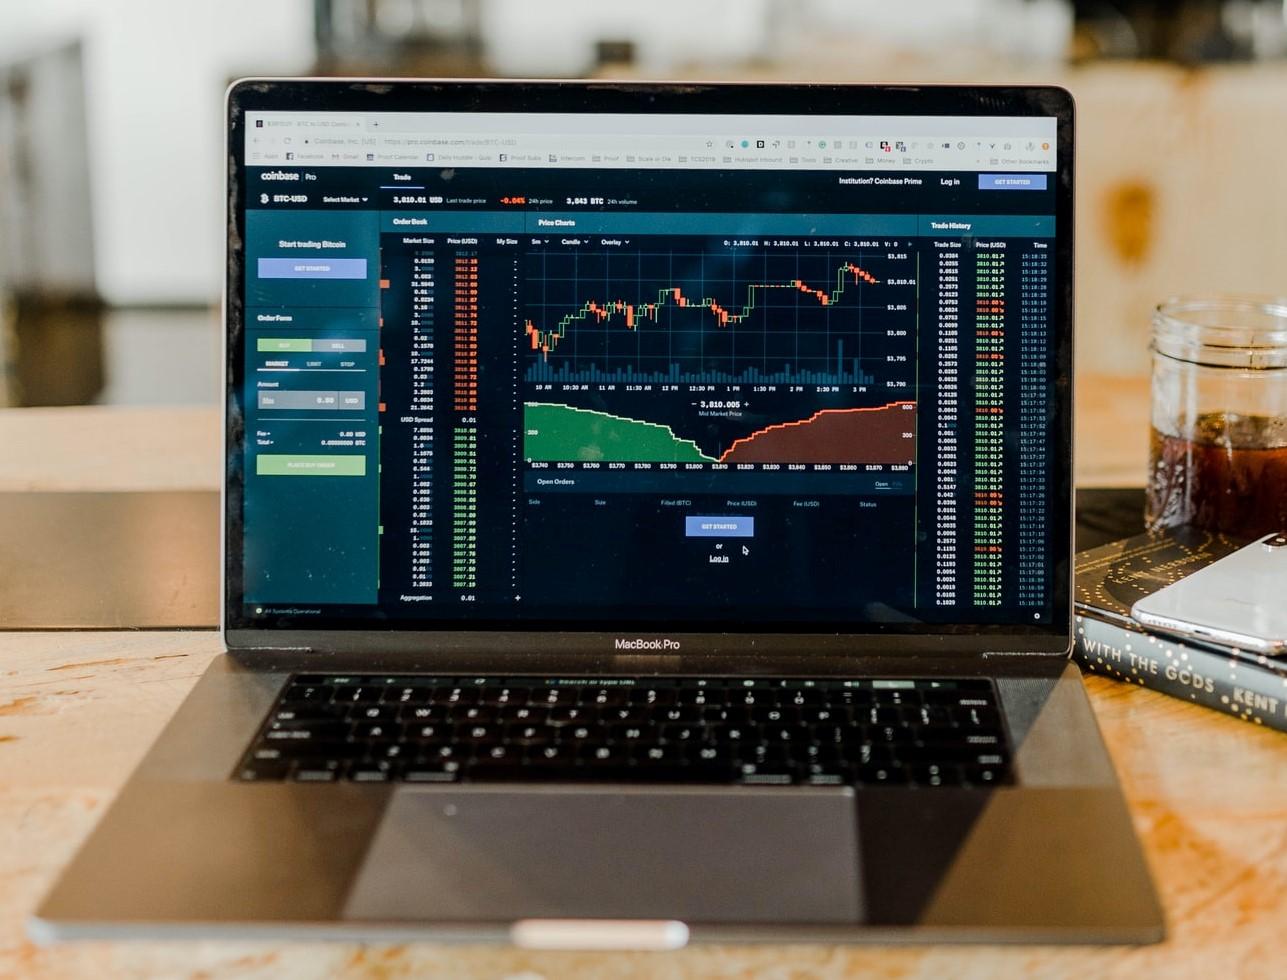 Data on laptop screen